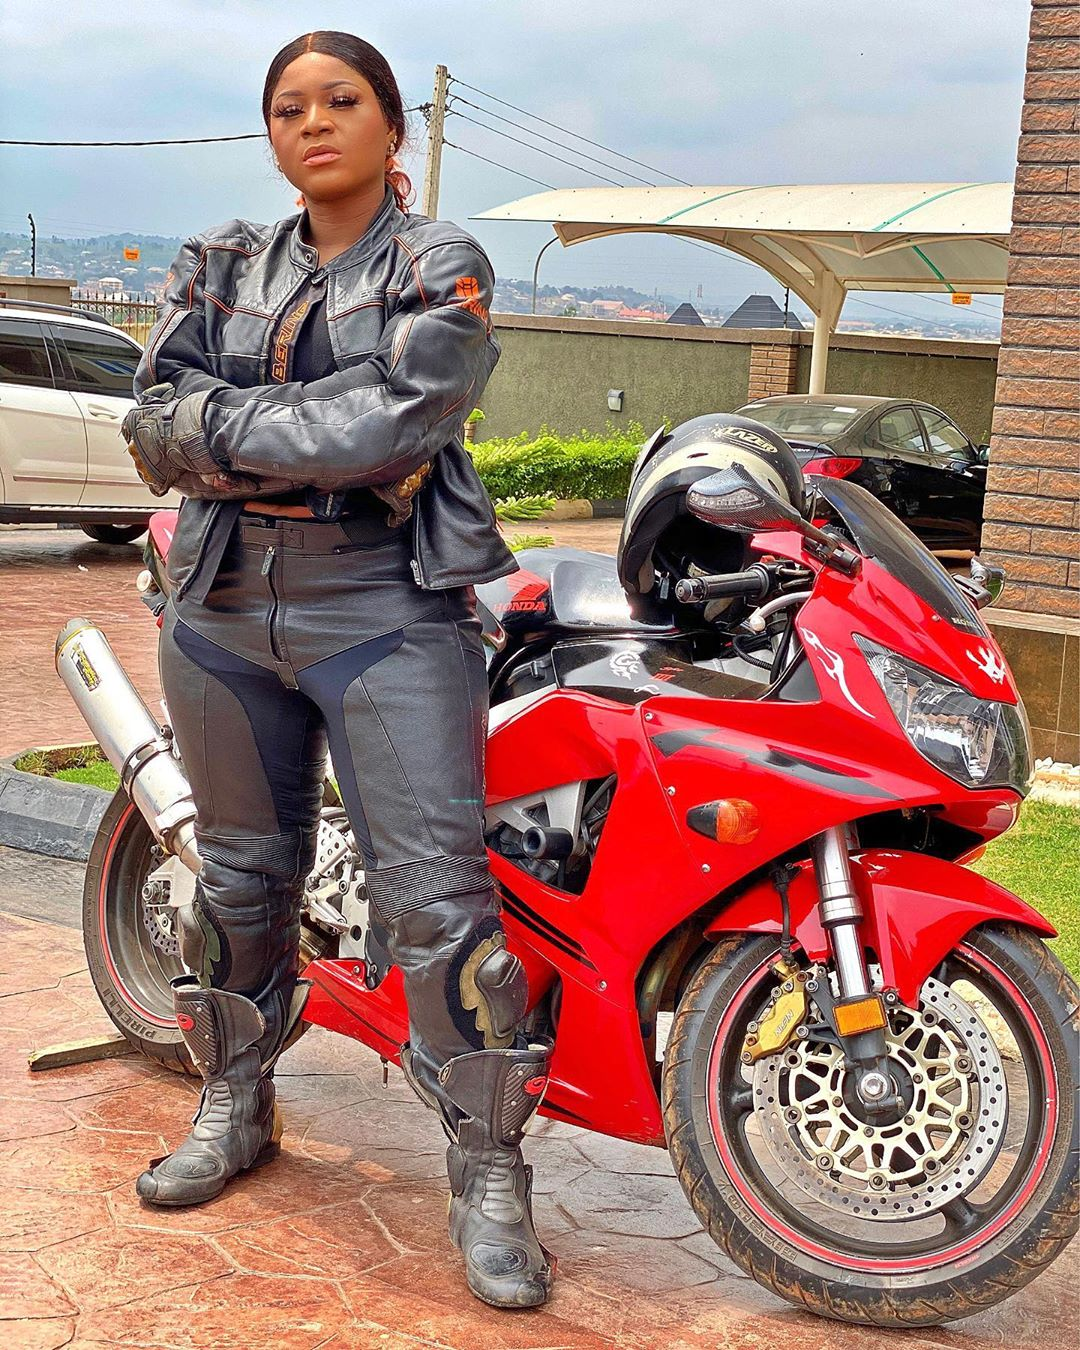 Destiny Etiko Is A Hot Biker In New Snap